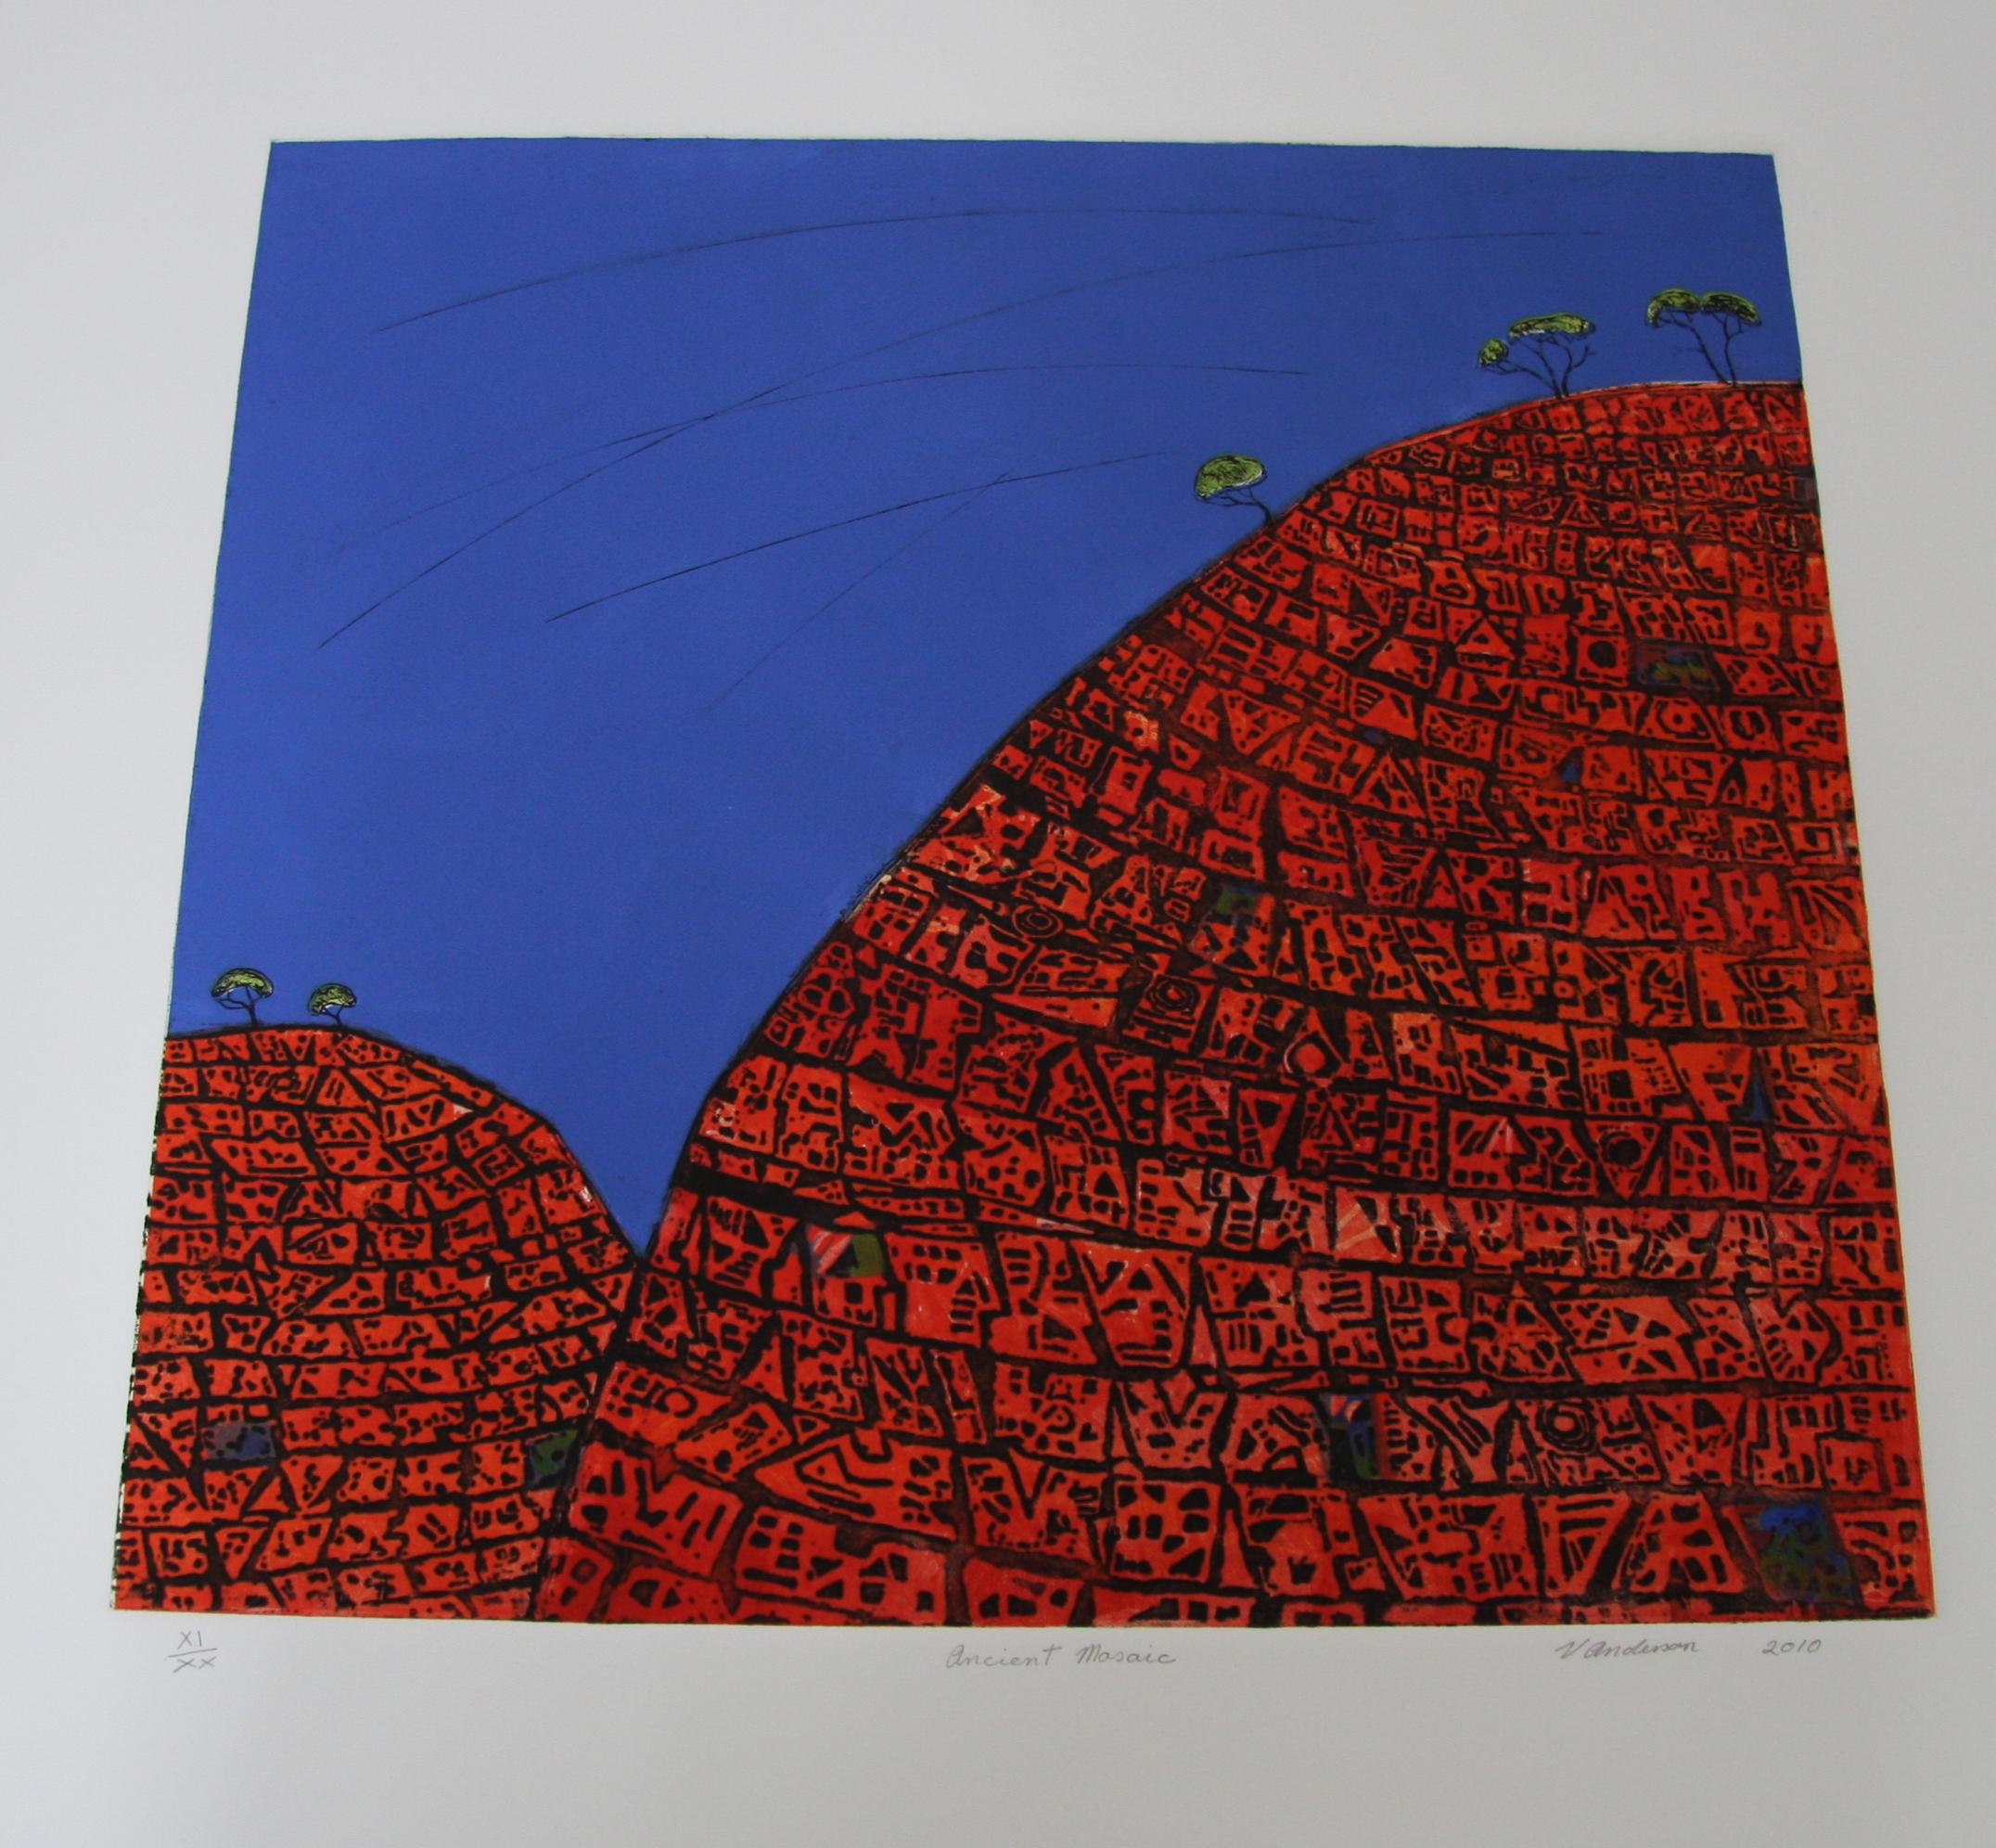 Original Artwork By Perth Artists For Sale | Online Art